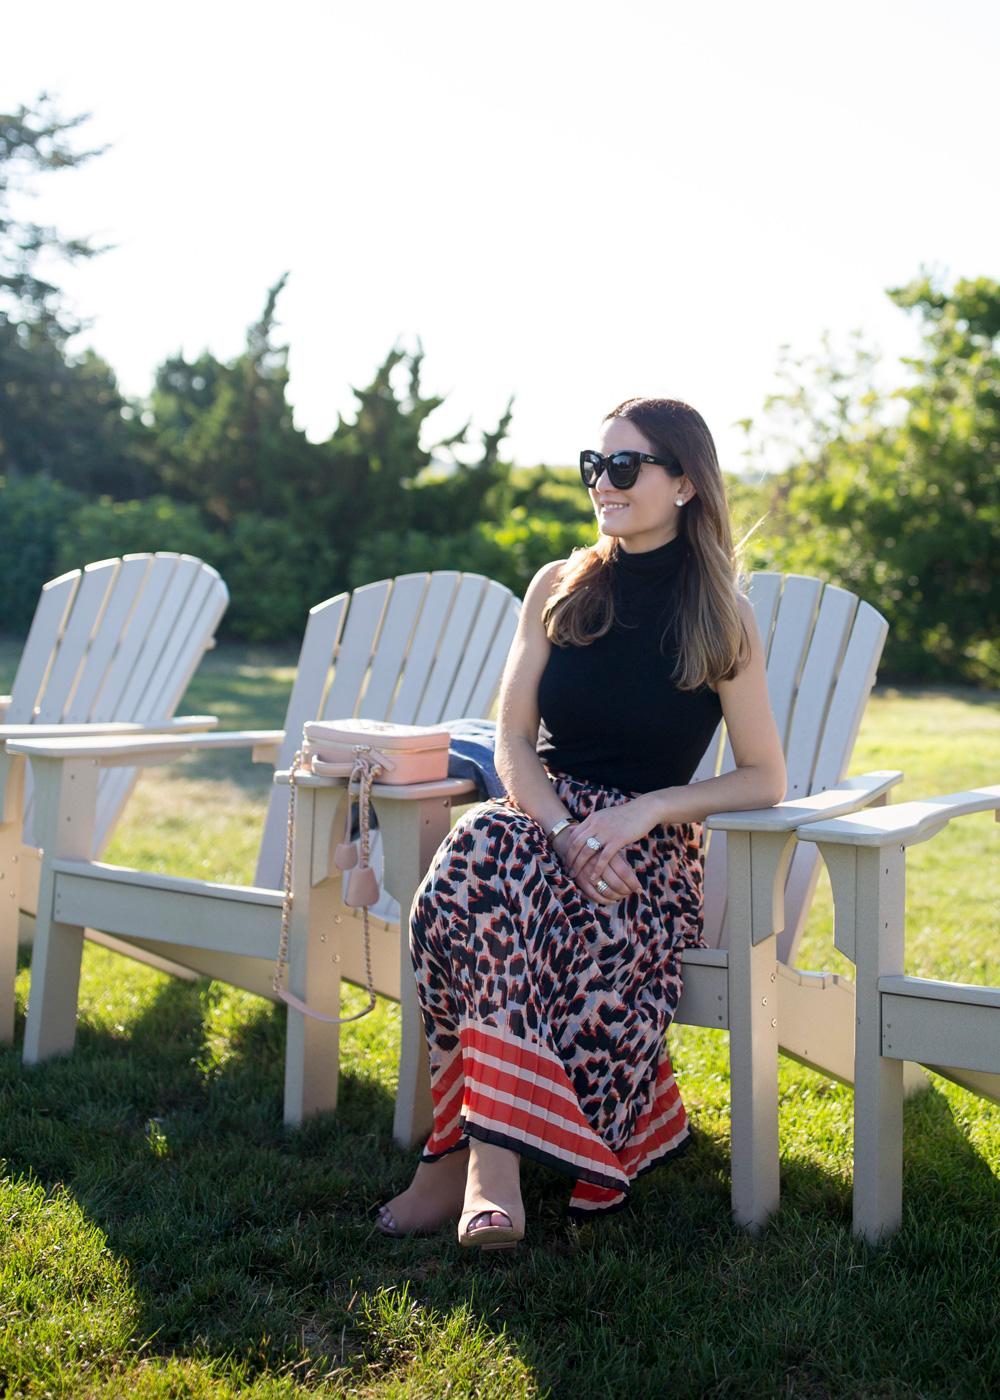 ASOS Pleated Leopard Skirt